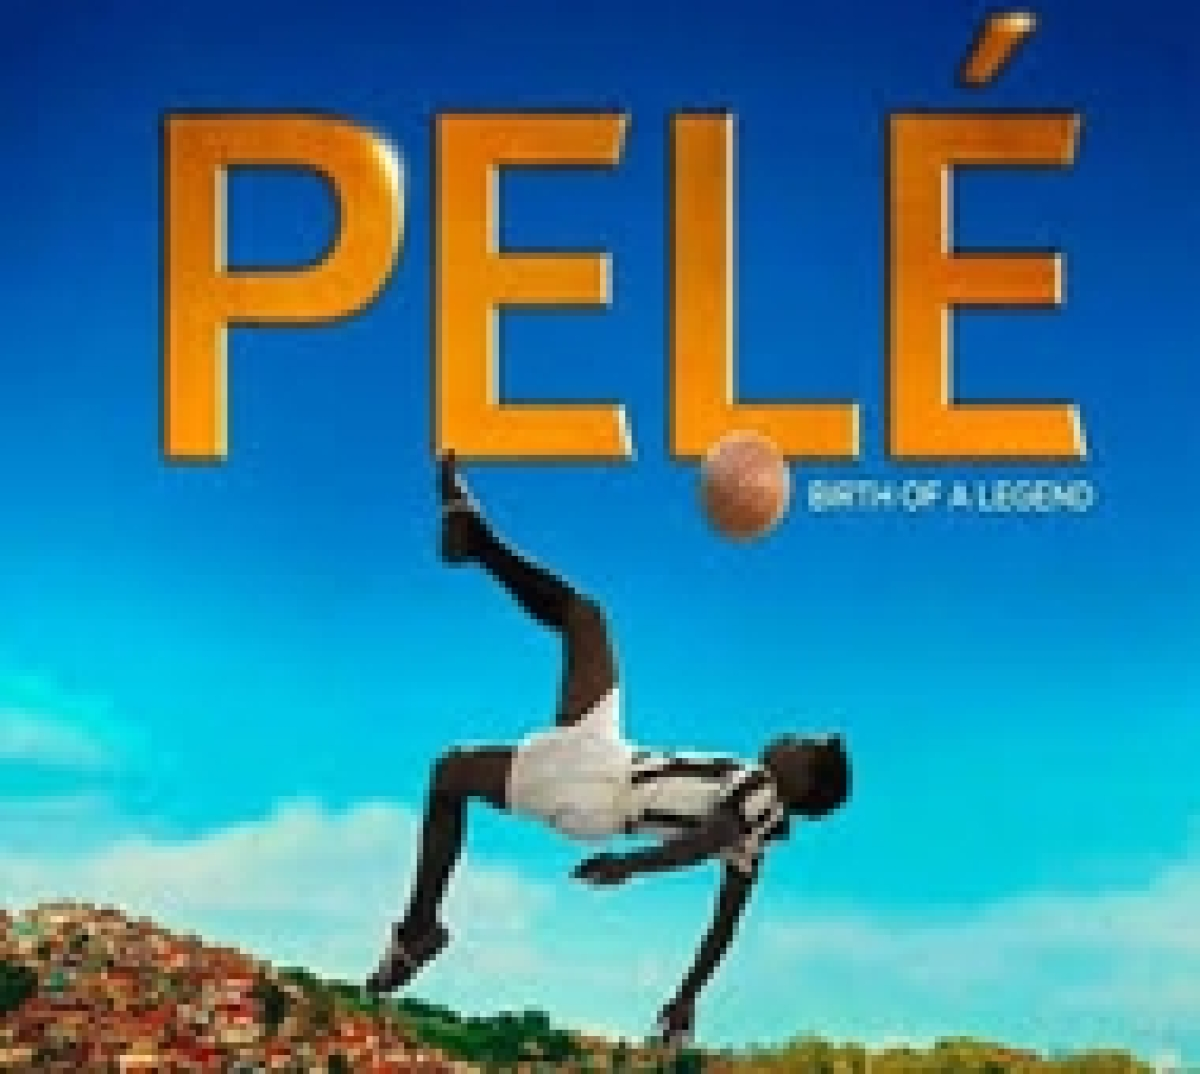 A.R. Rahman launches trailer of 'Pele: Birth of a Legend'